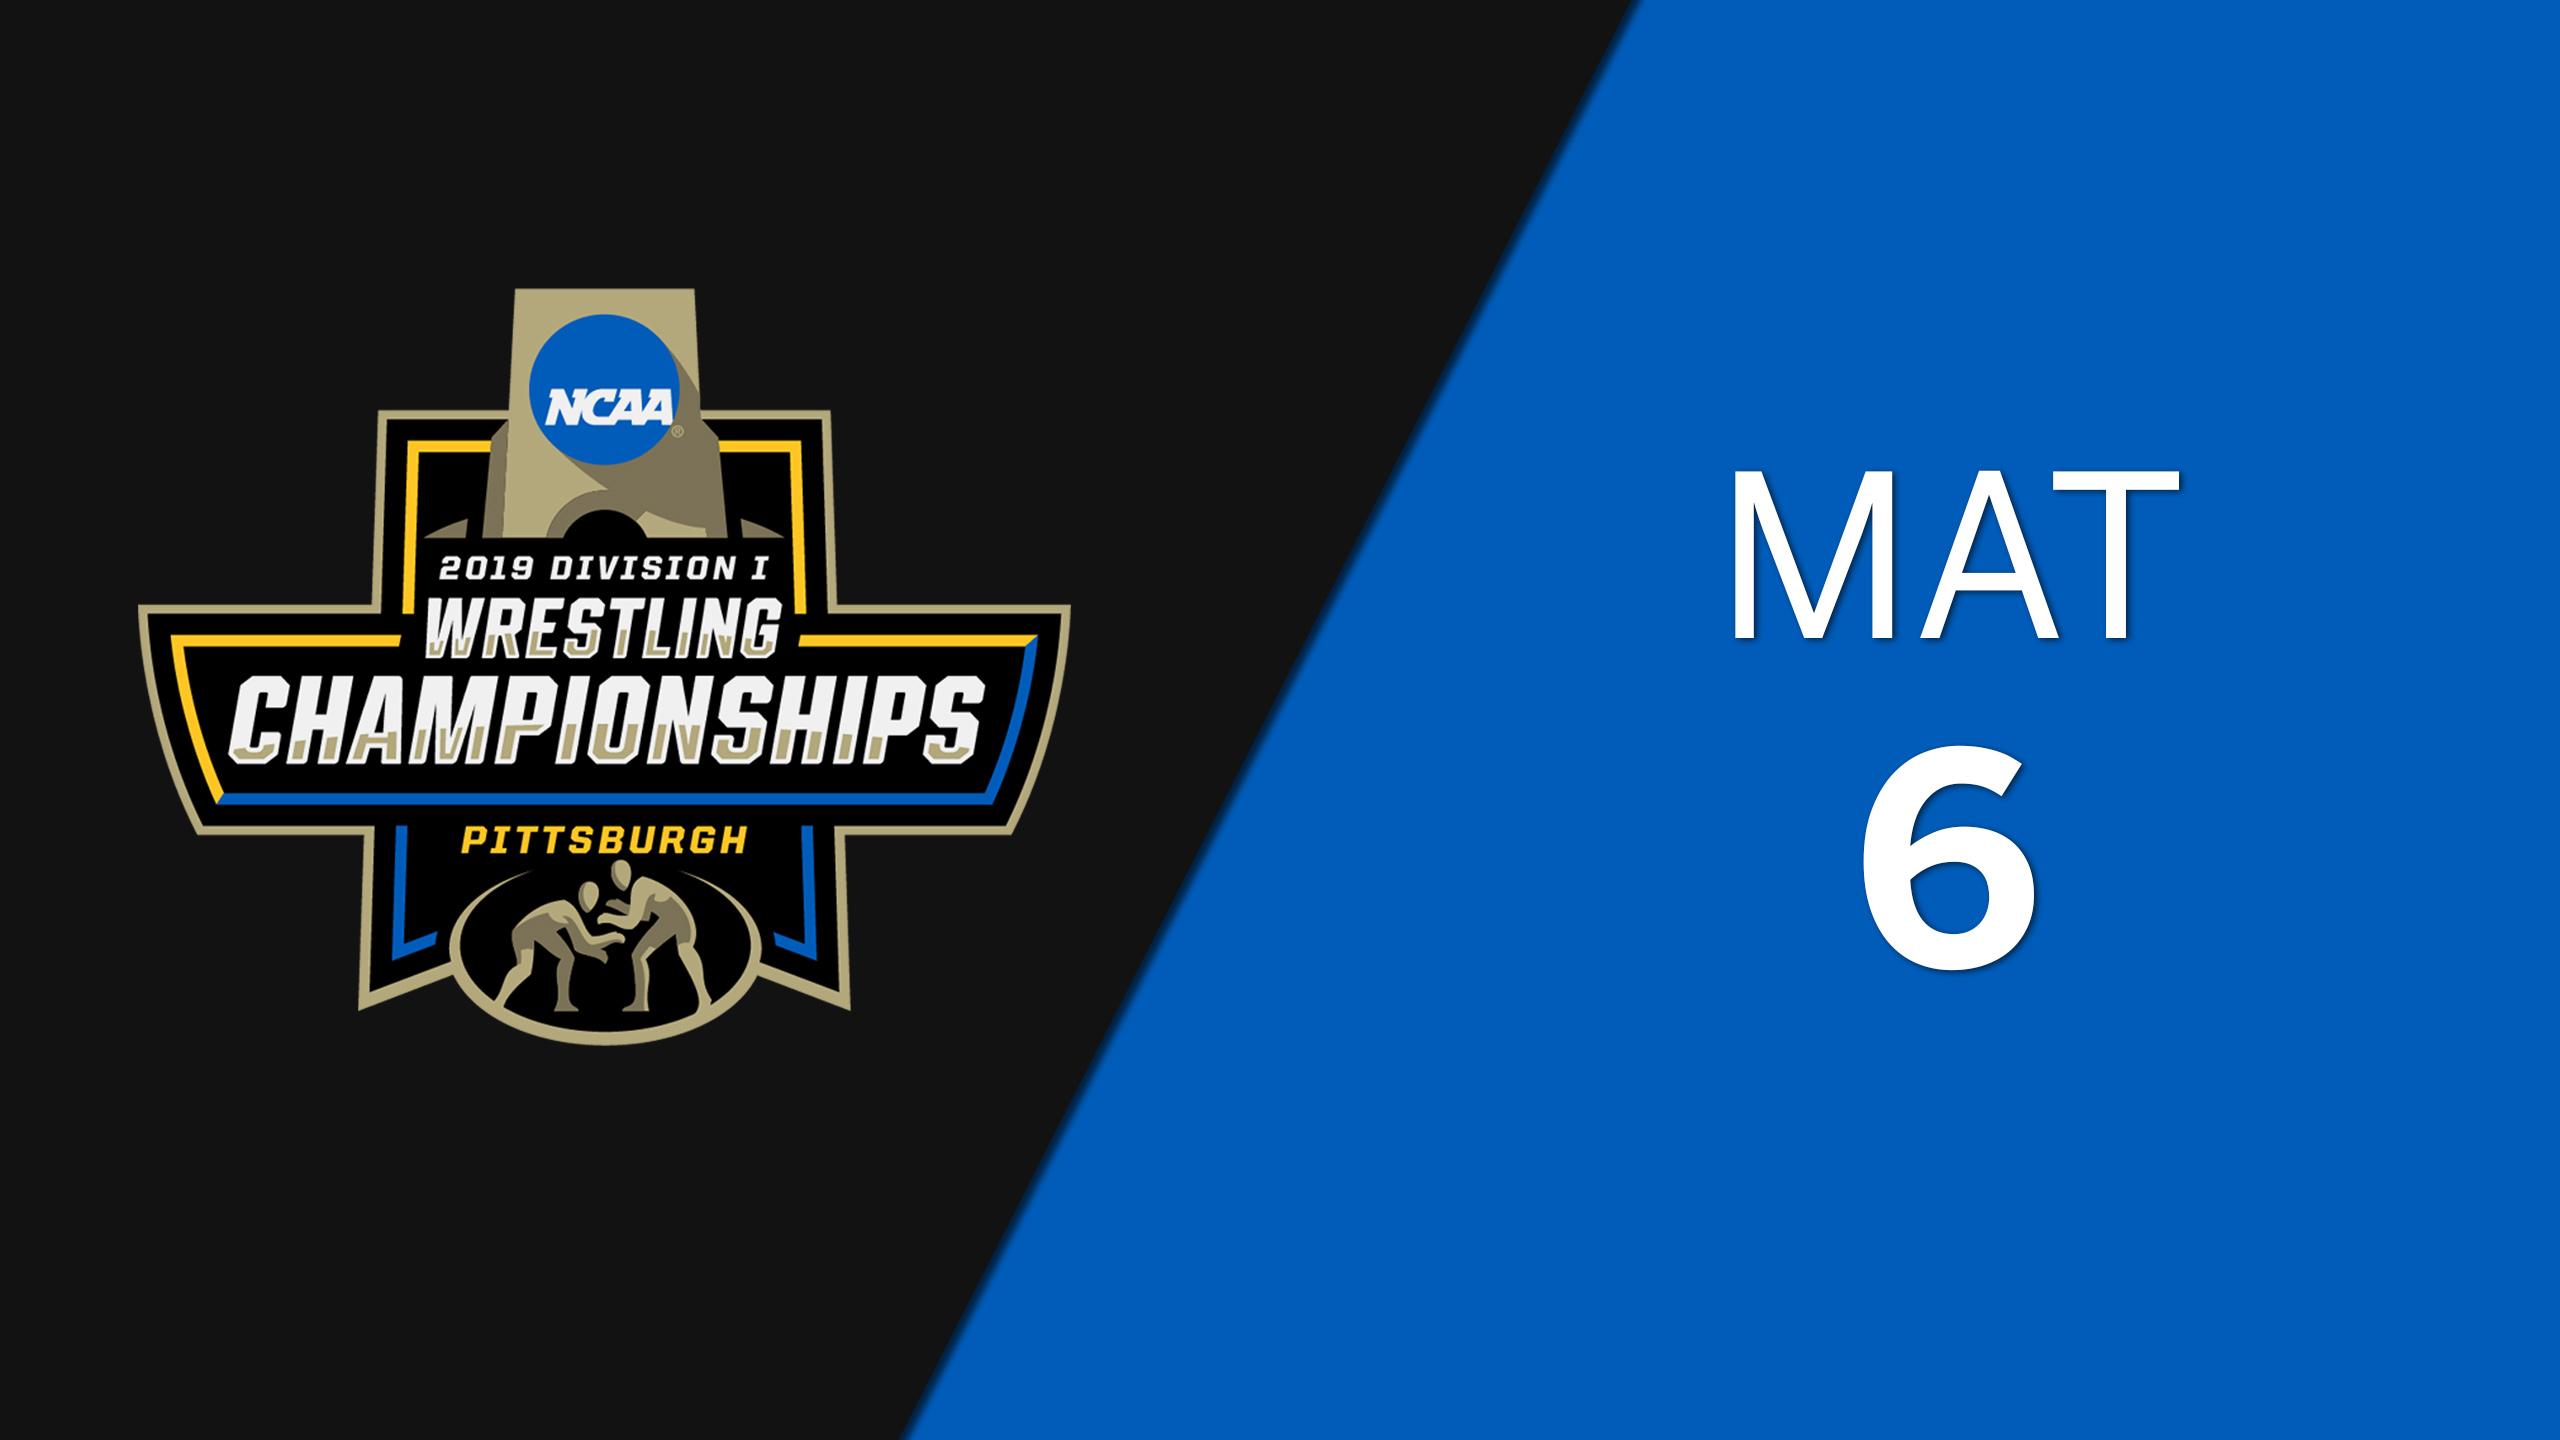 NCAA Wrestling Championship (Mat 6, First Round)